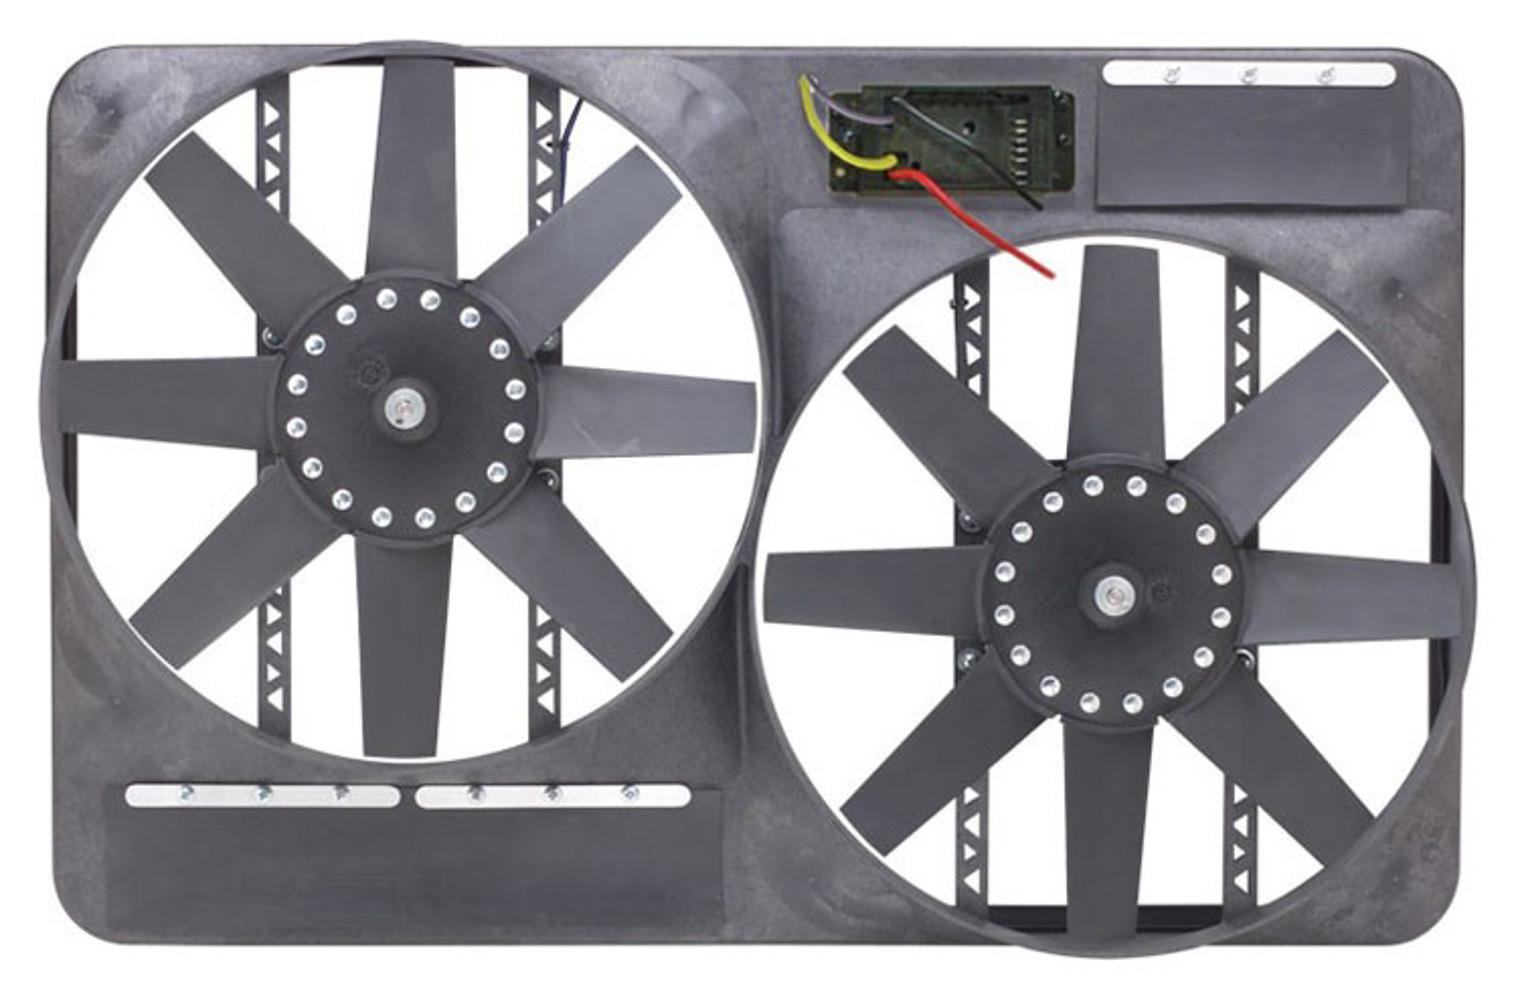 Flex-A-Lite 105398 Electric Cooling Fan, Direct-Fit, Dual 13-1/2 in Fan, Puller, 4600 CFM, 12V, Straight Blade, Controller, Plastic, GM Fullsize SUV / Truck 2000-04, Kit